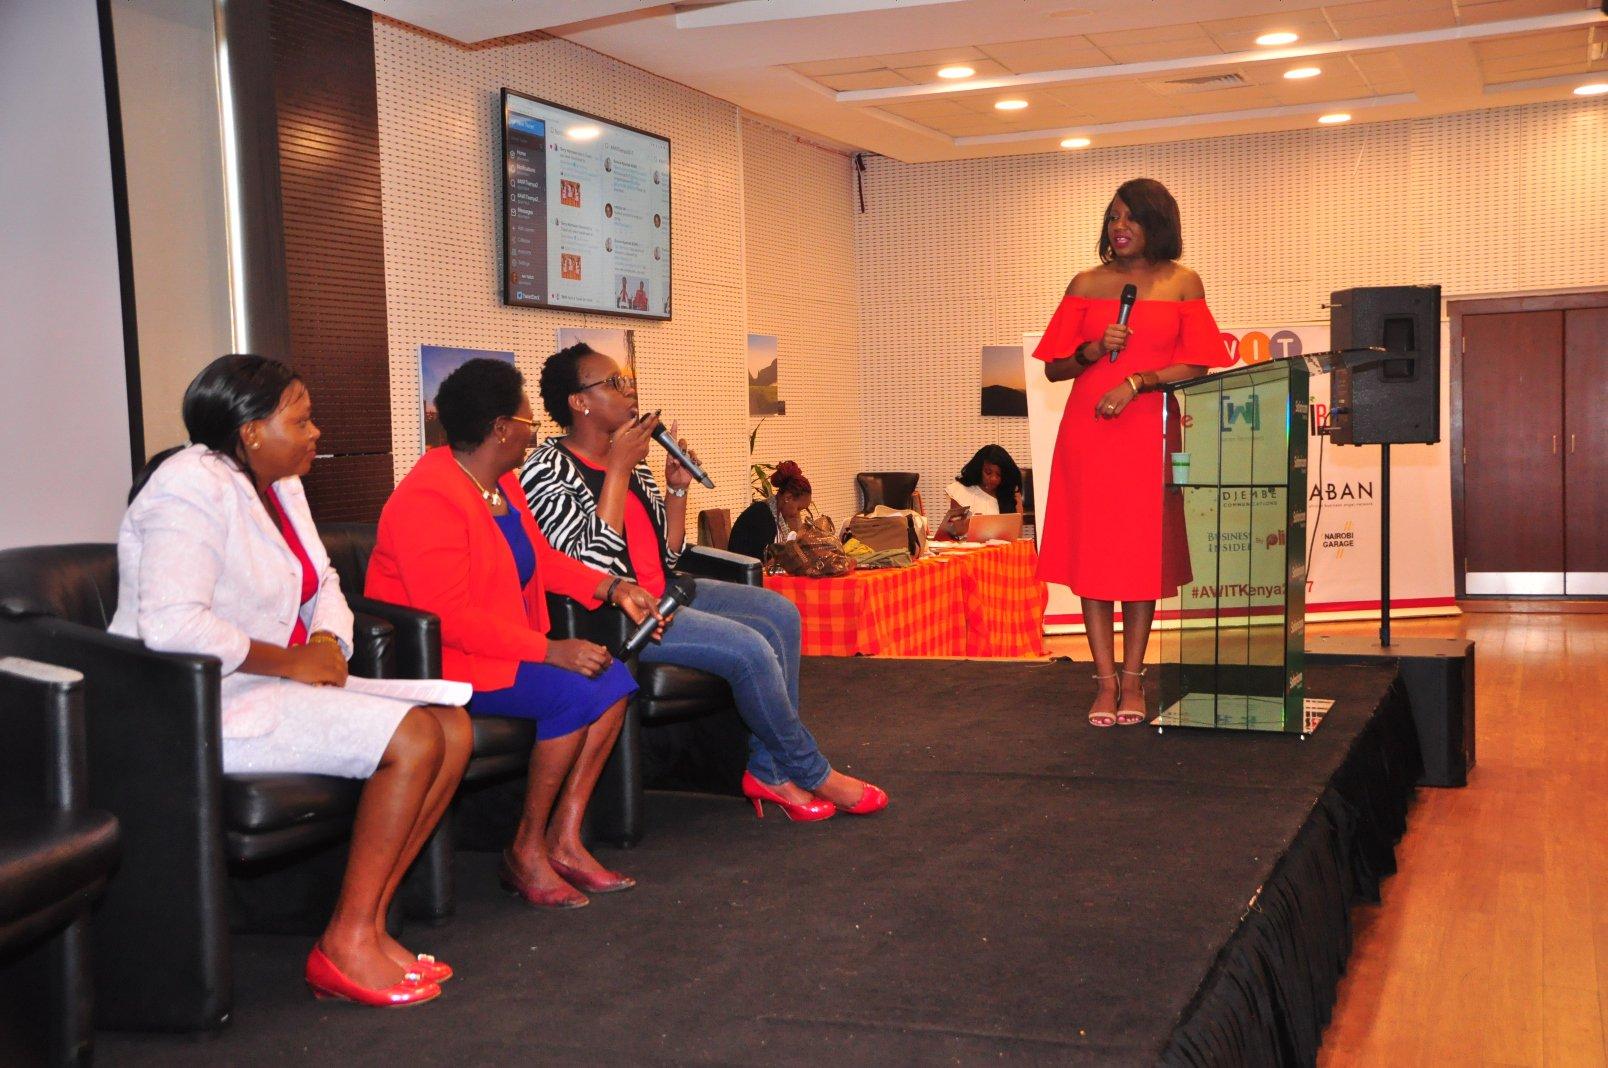 Wisdom never grows old #AWITkenya2017 Conference Happening Now @SafaricomLtd  #WomenInTech #day2  #Africa #Kenya Photo Courtesy: @ianYatich https://t.co/6VeNJrv9YX